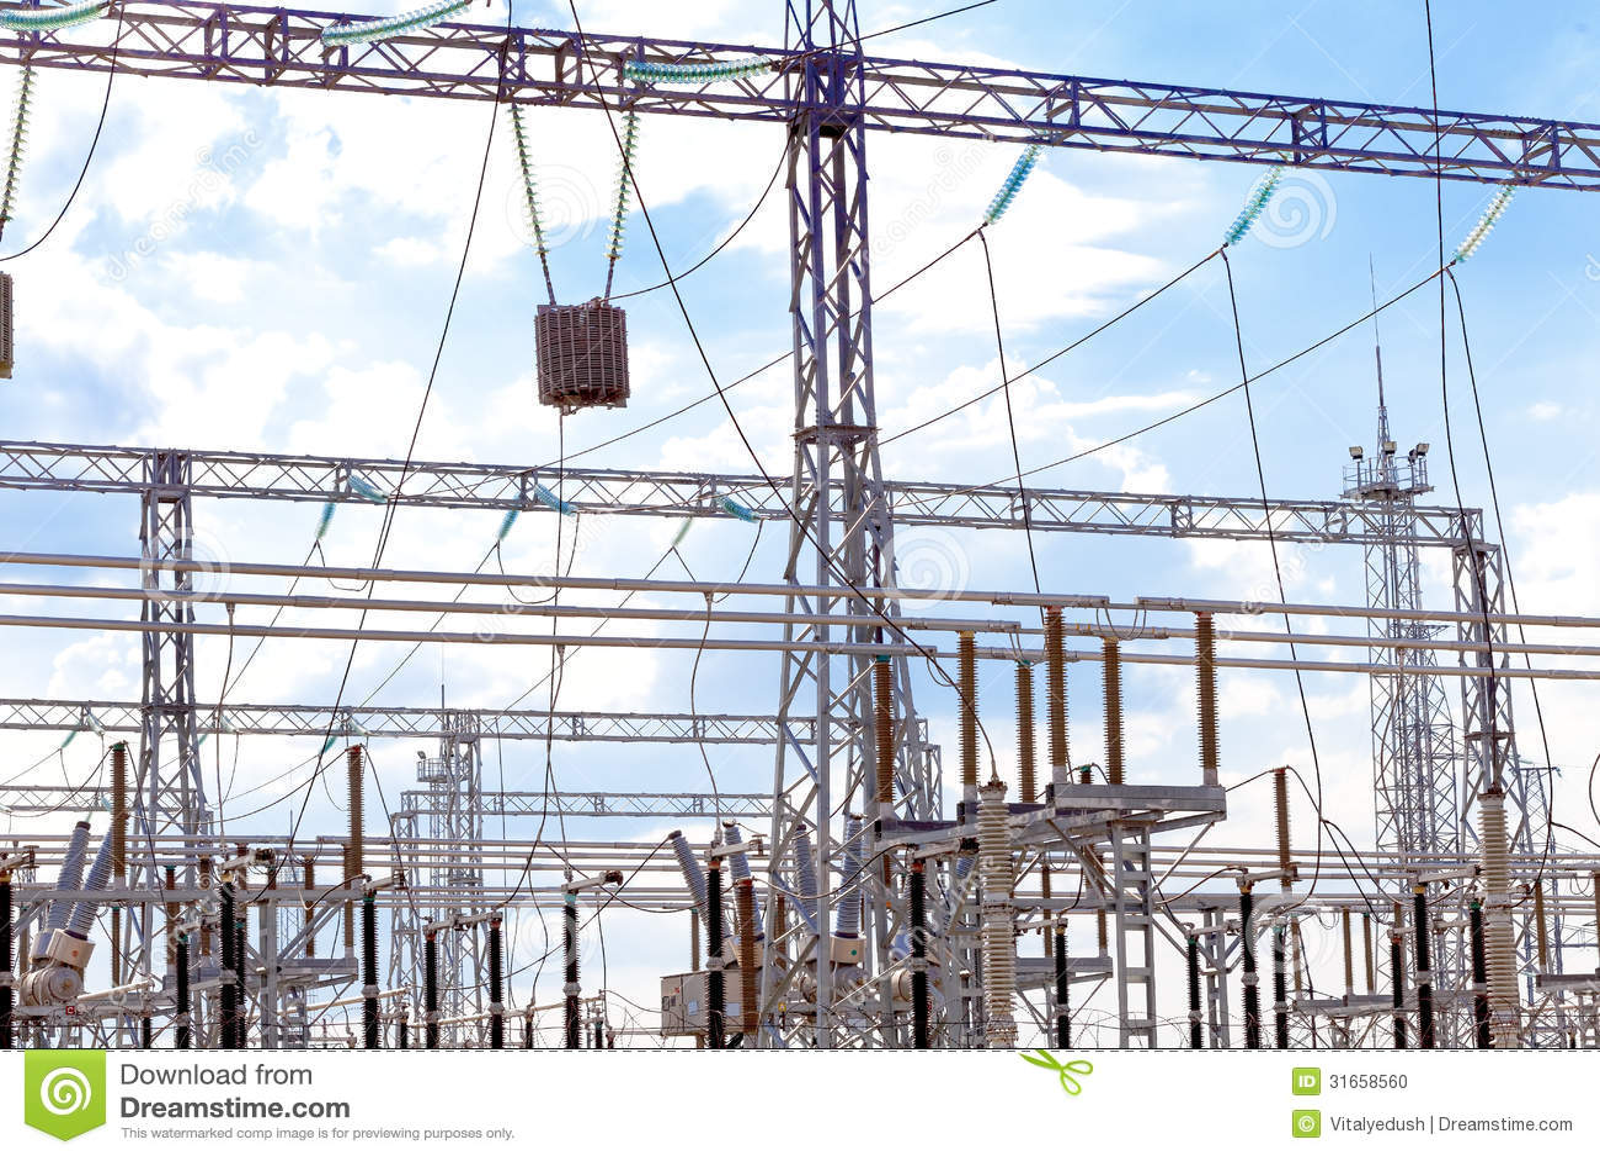 Gachinco gachi765 fhd all for Electrical substation design fundamentals pdf